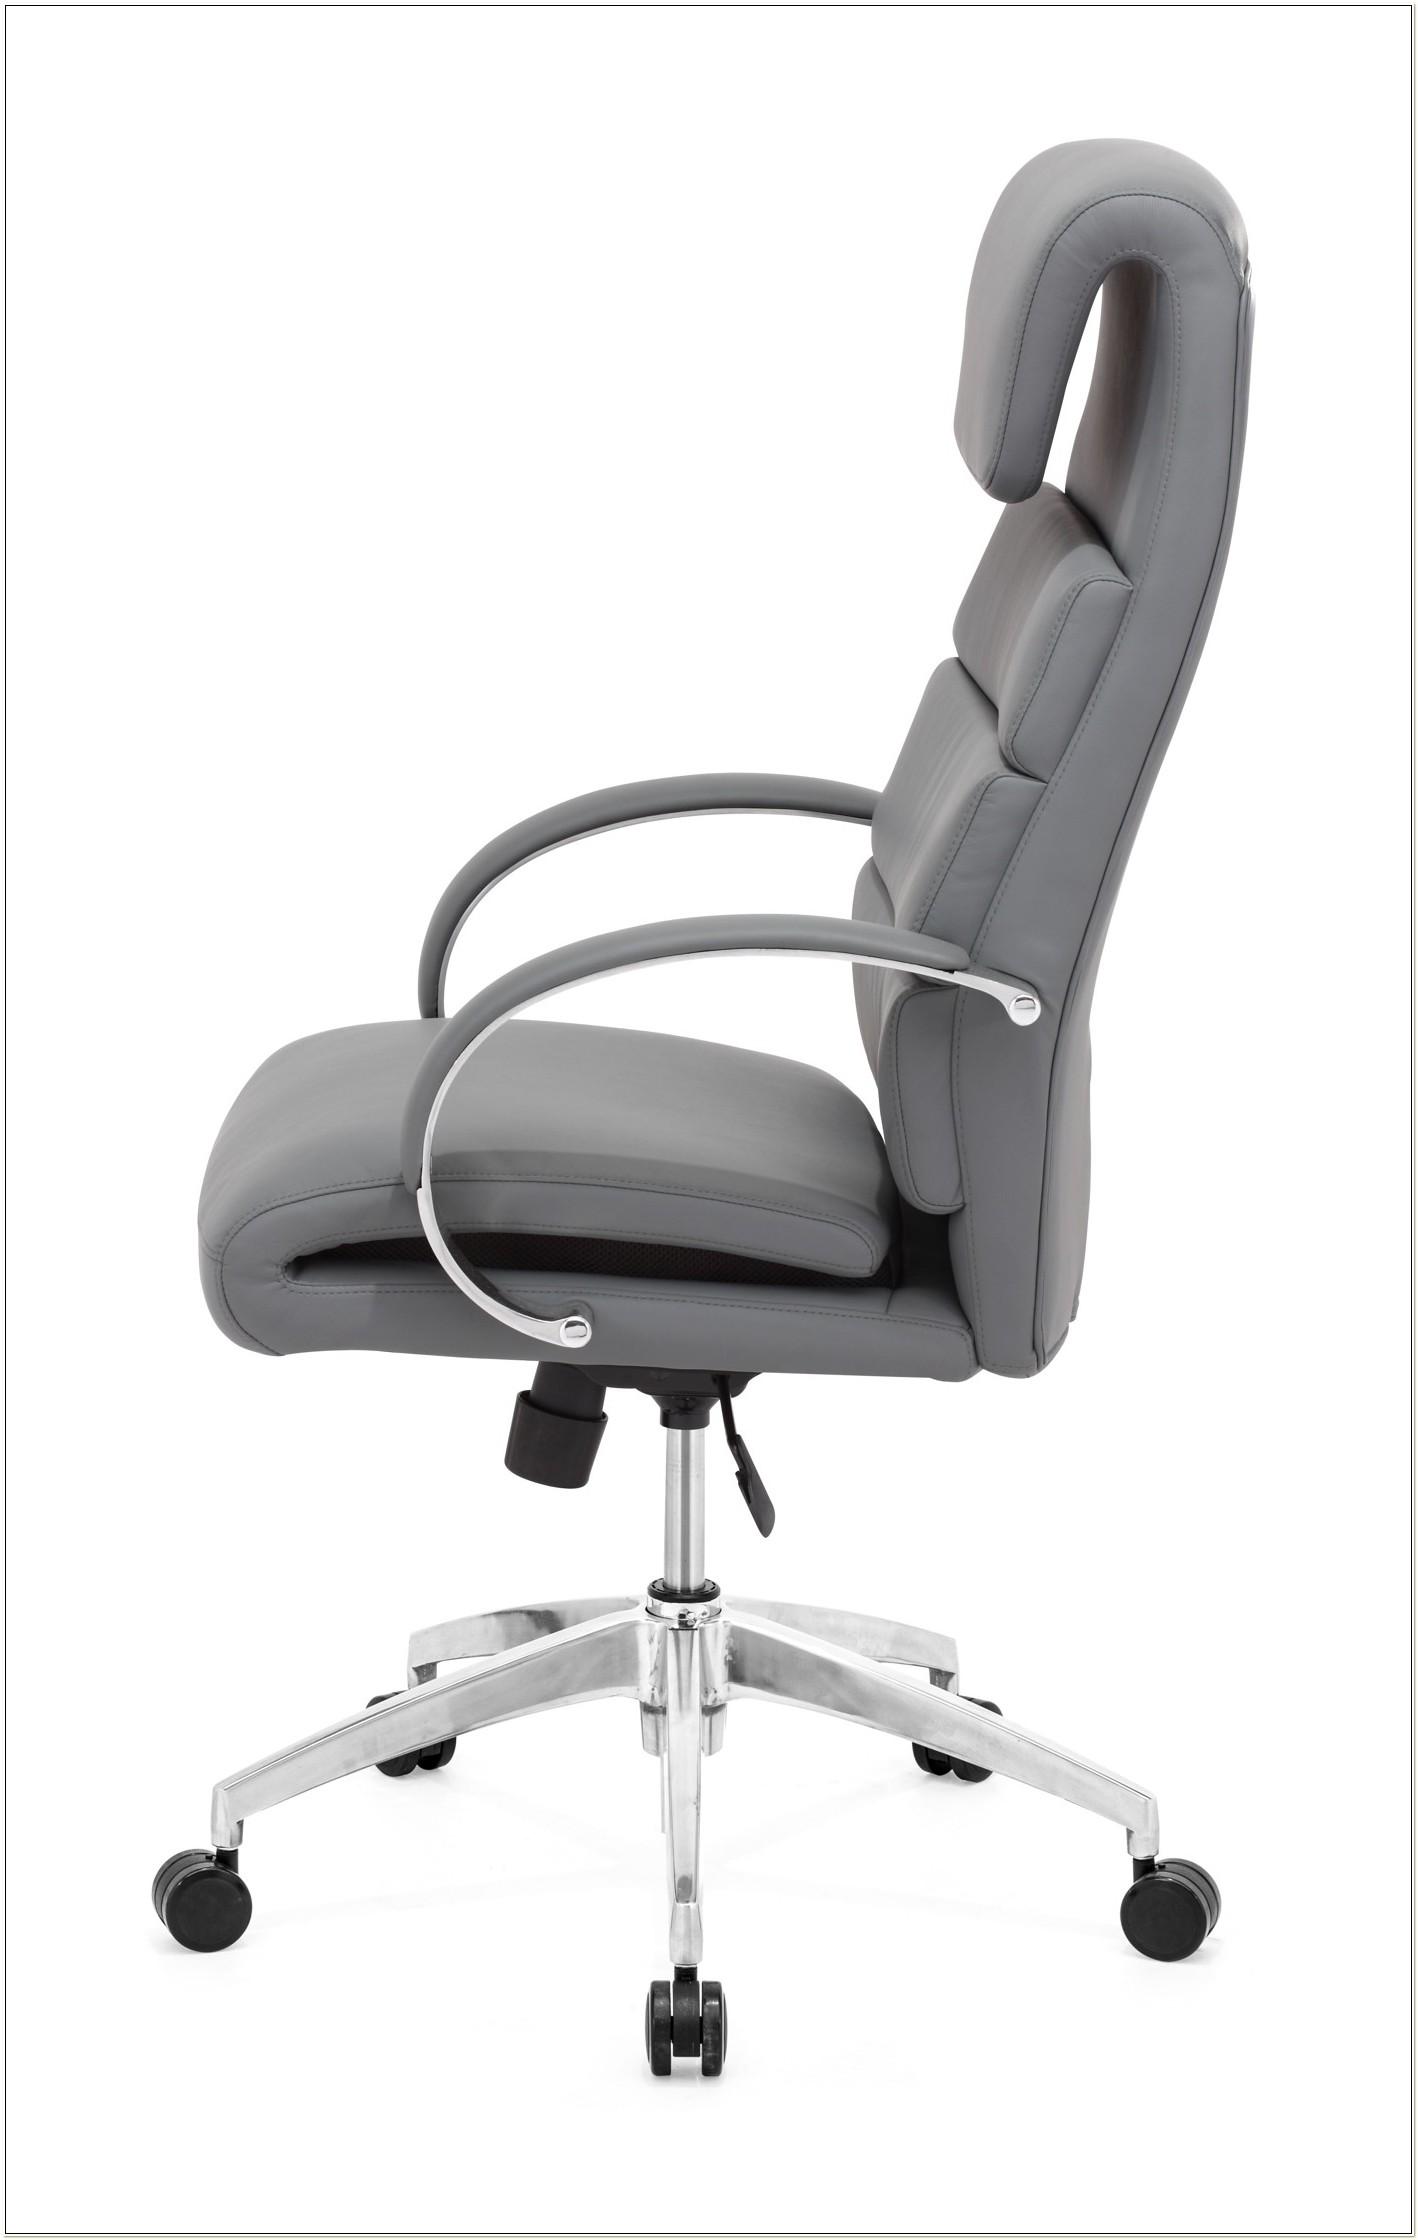 Tempur Pedic 8000 Ergonomic Chair